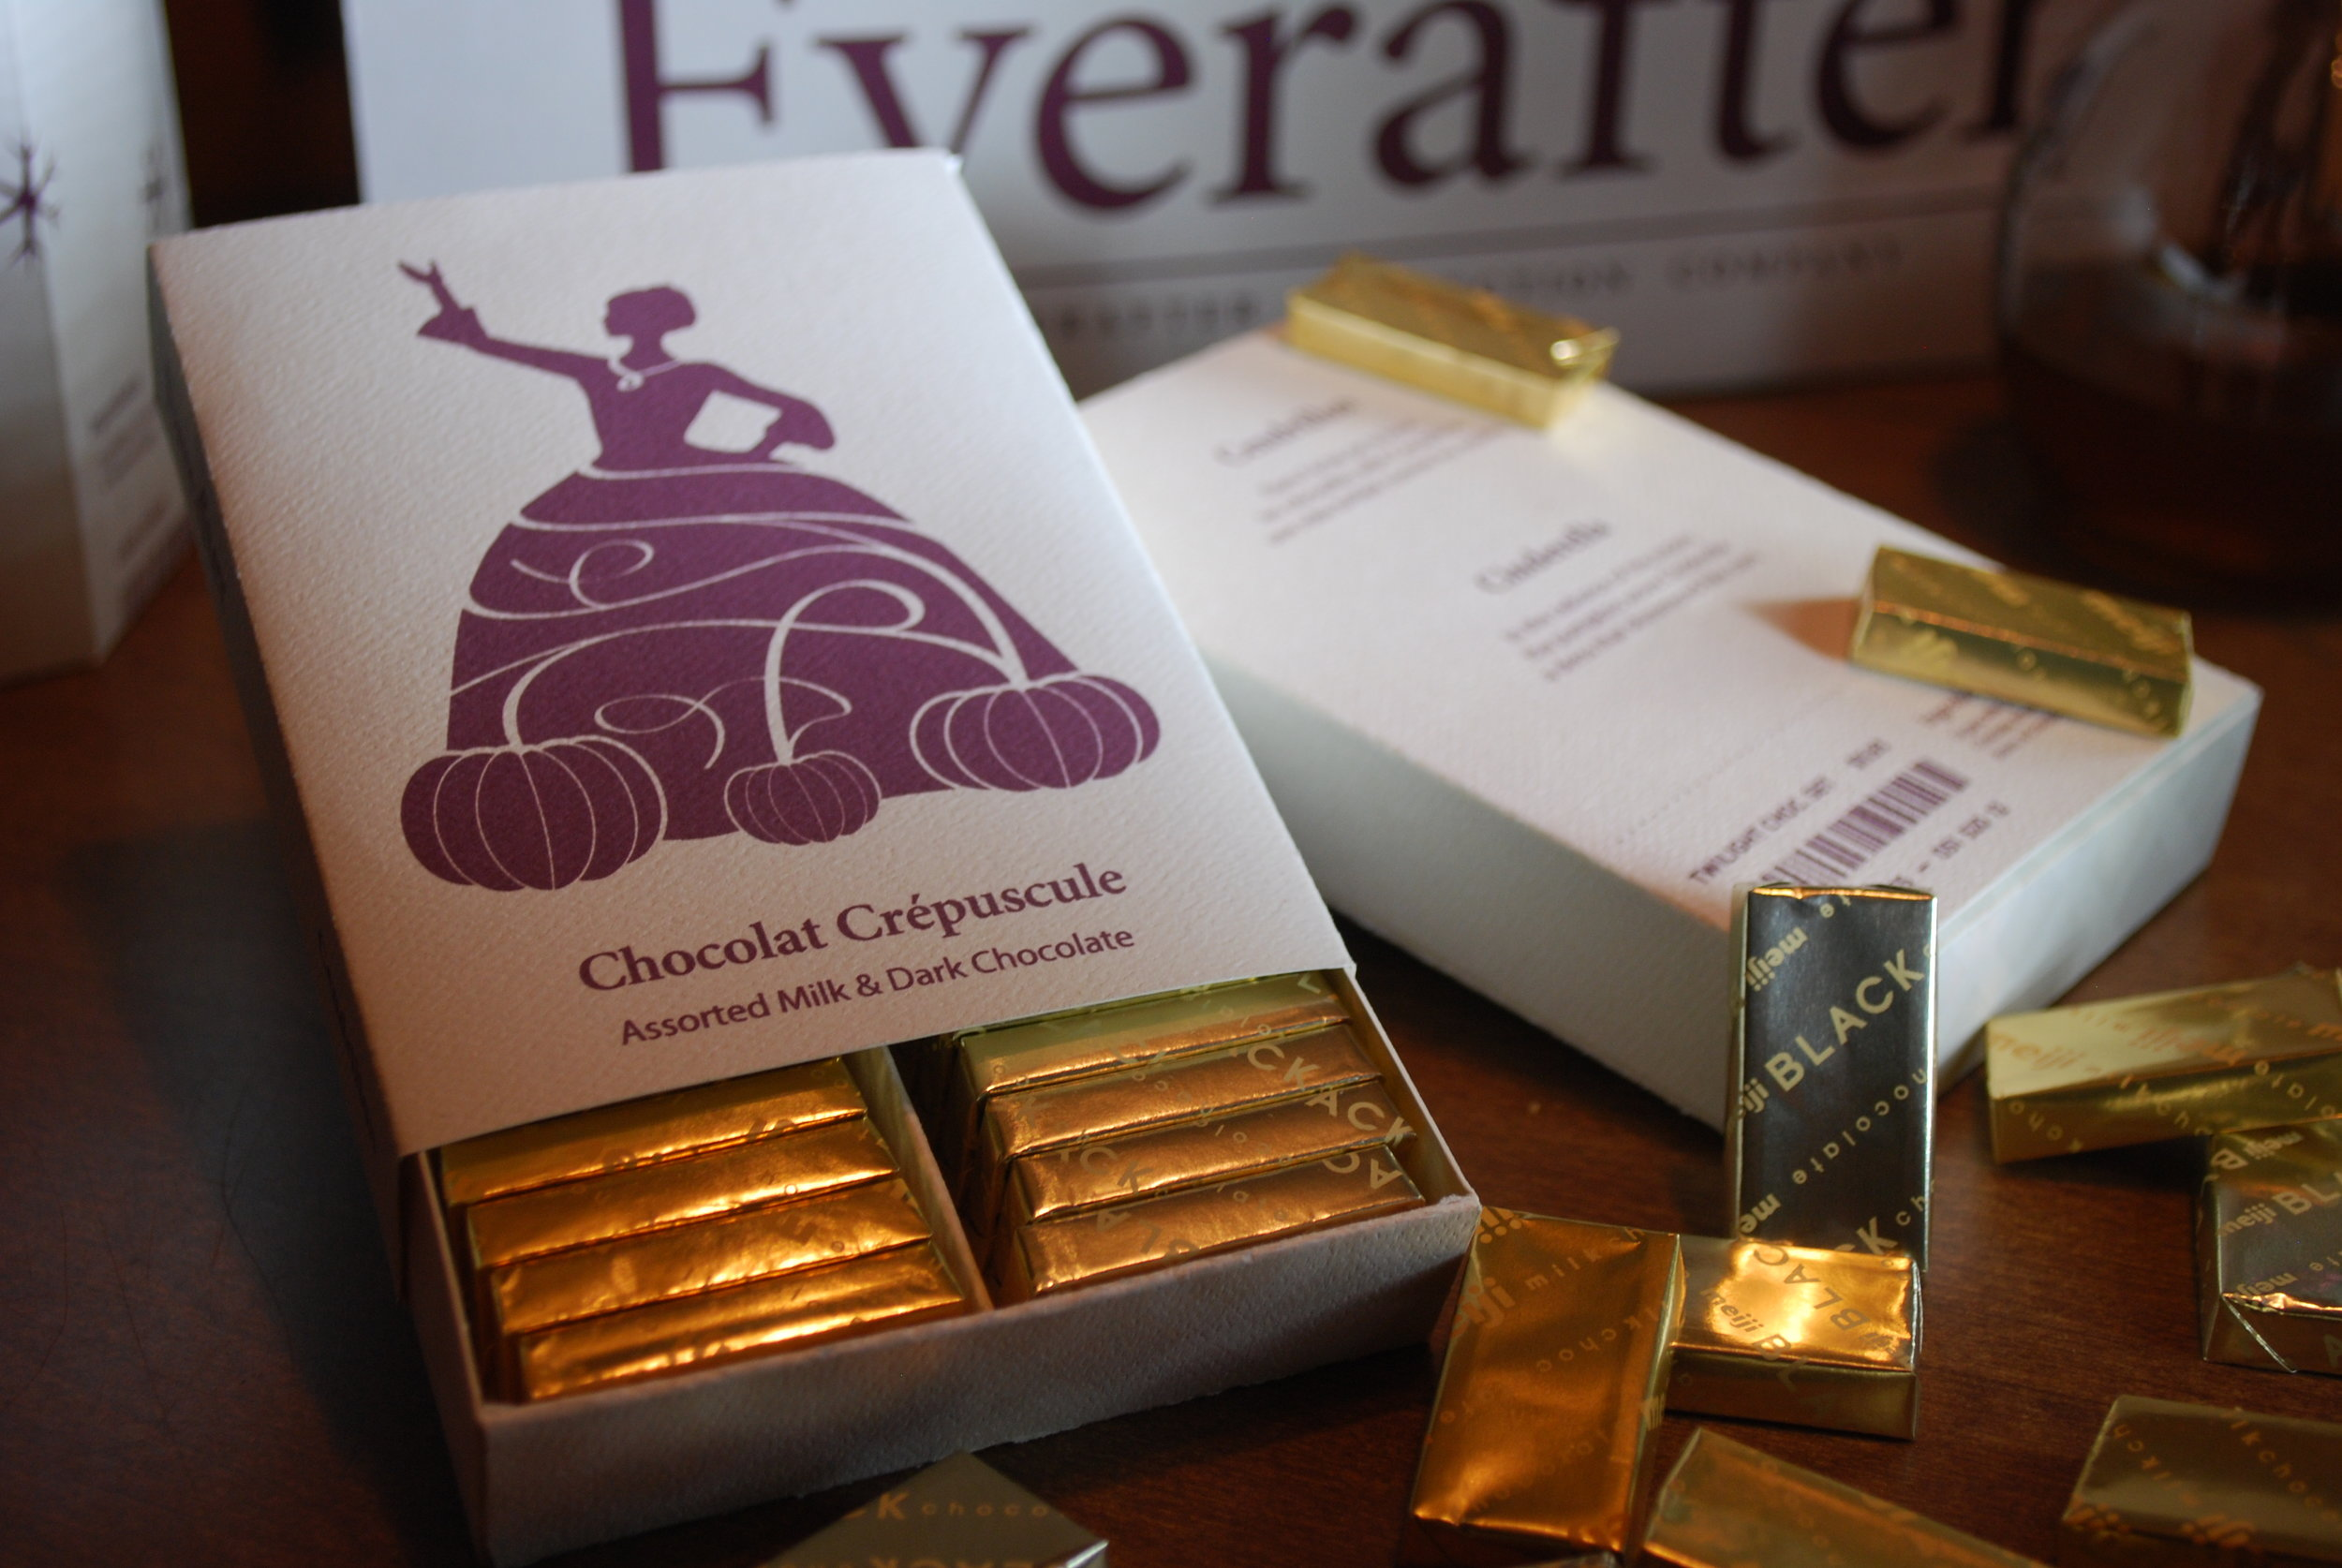 Cinderella's Chocolate Twilight packaging featuring dark and milk chocolate.